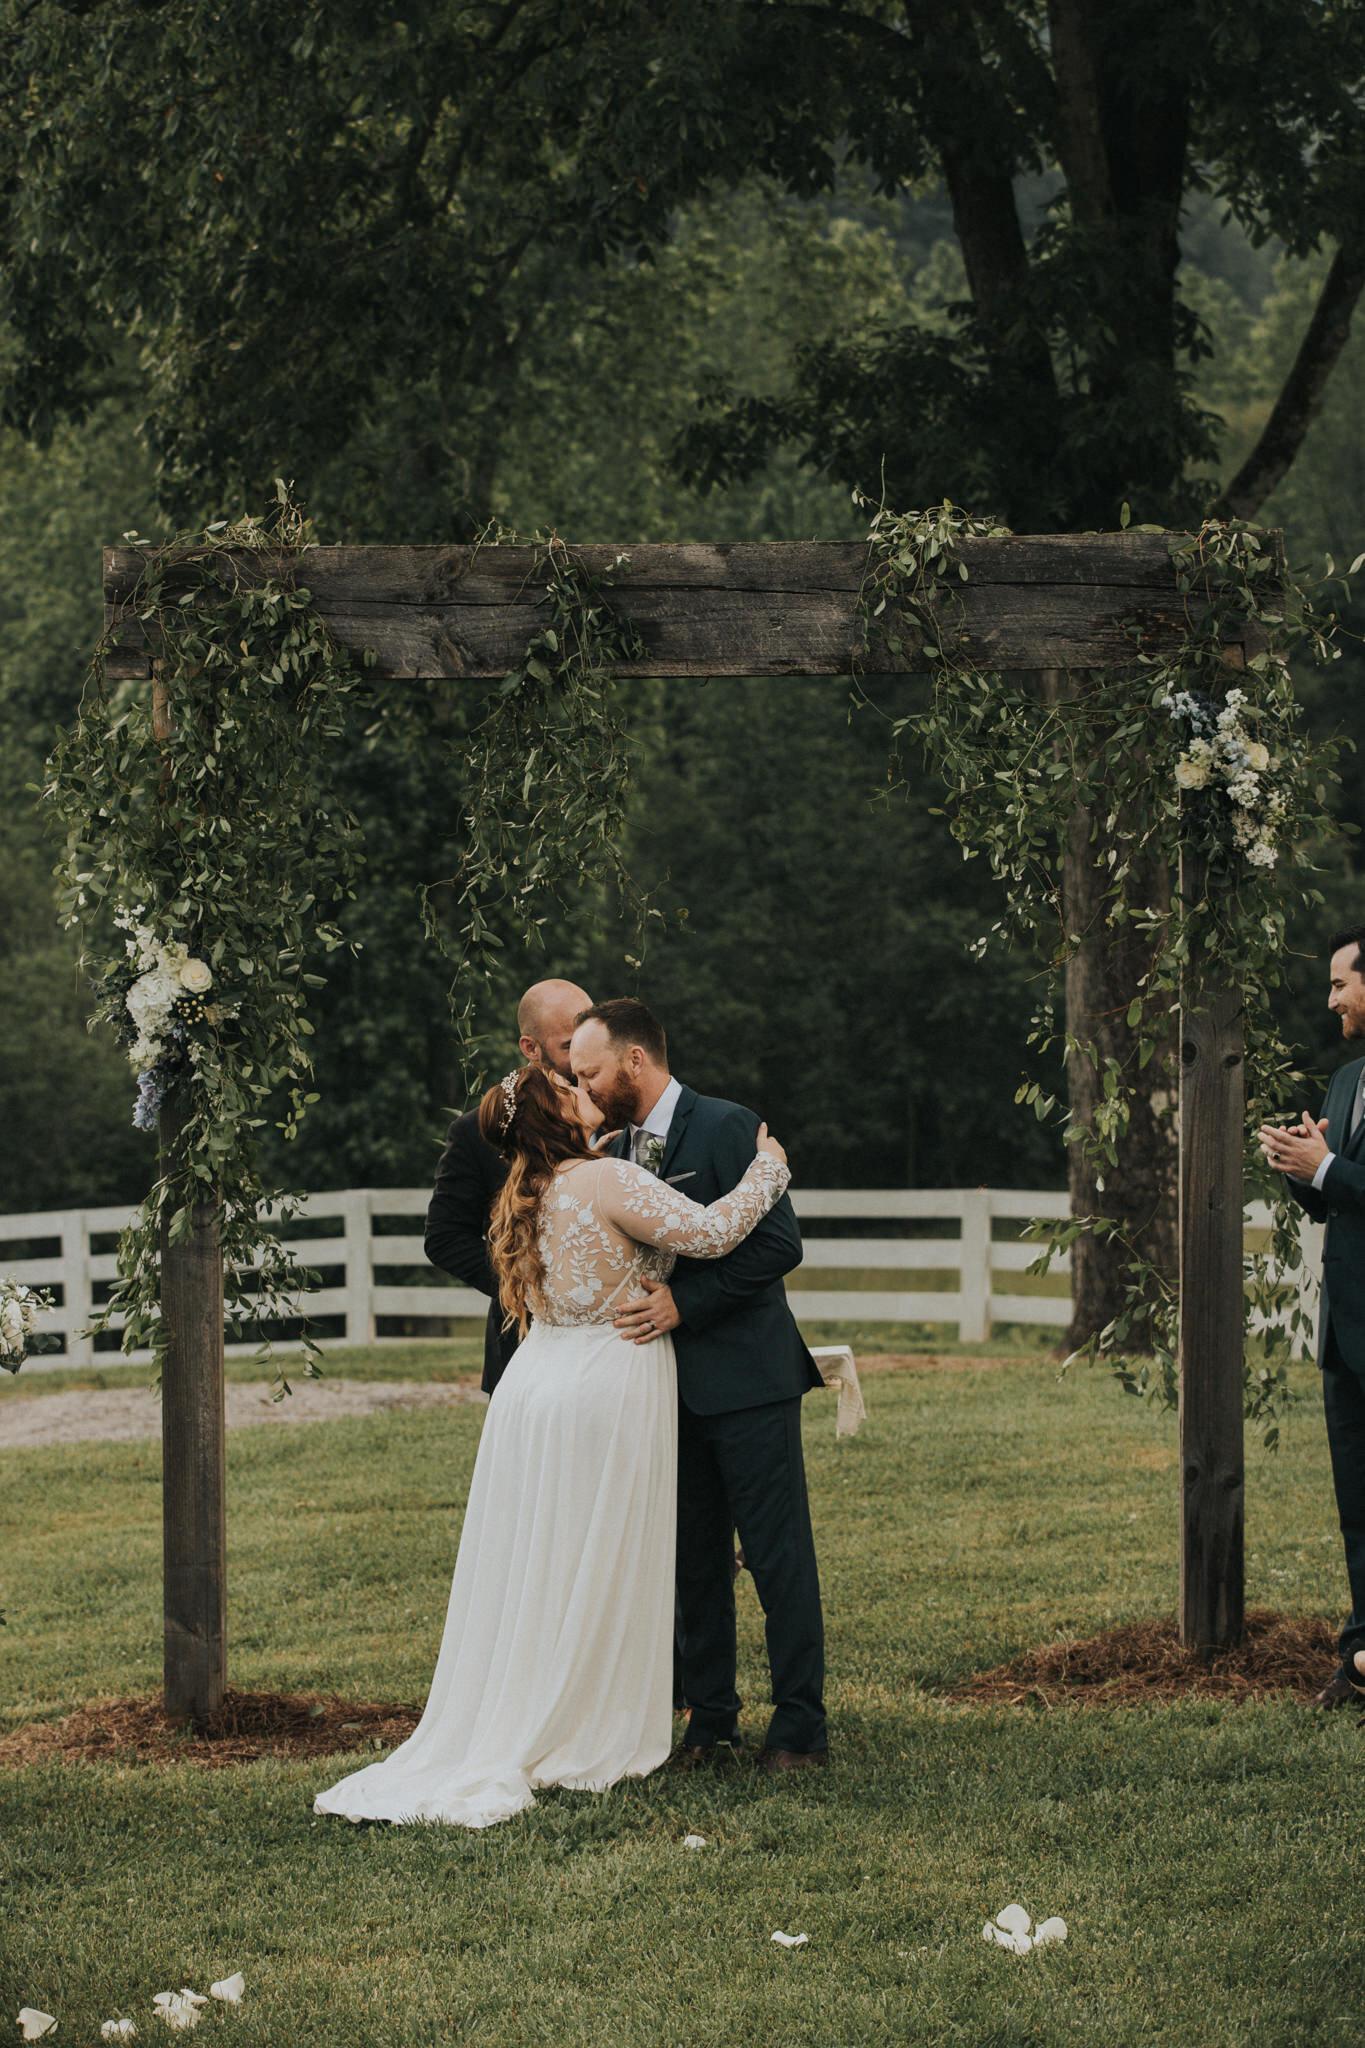 KateMatt-North-Georgia-Wedding-Photographer-Mountain-Laurel-Farm-112.jpg